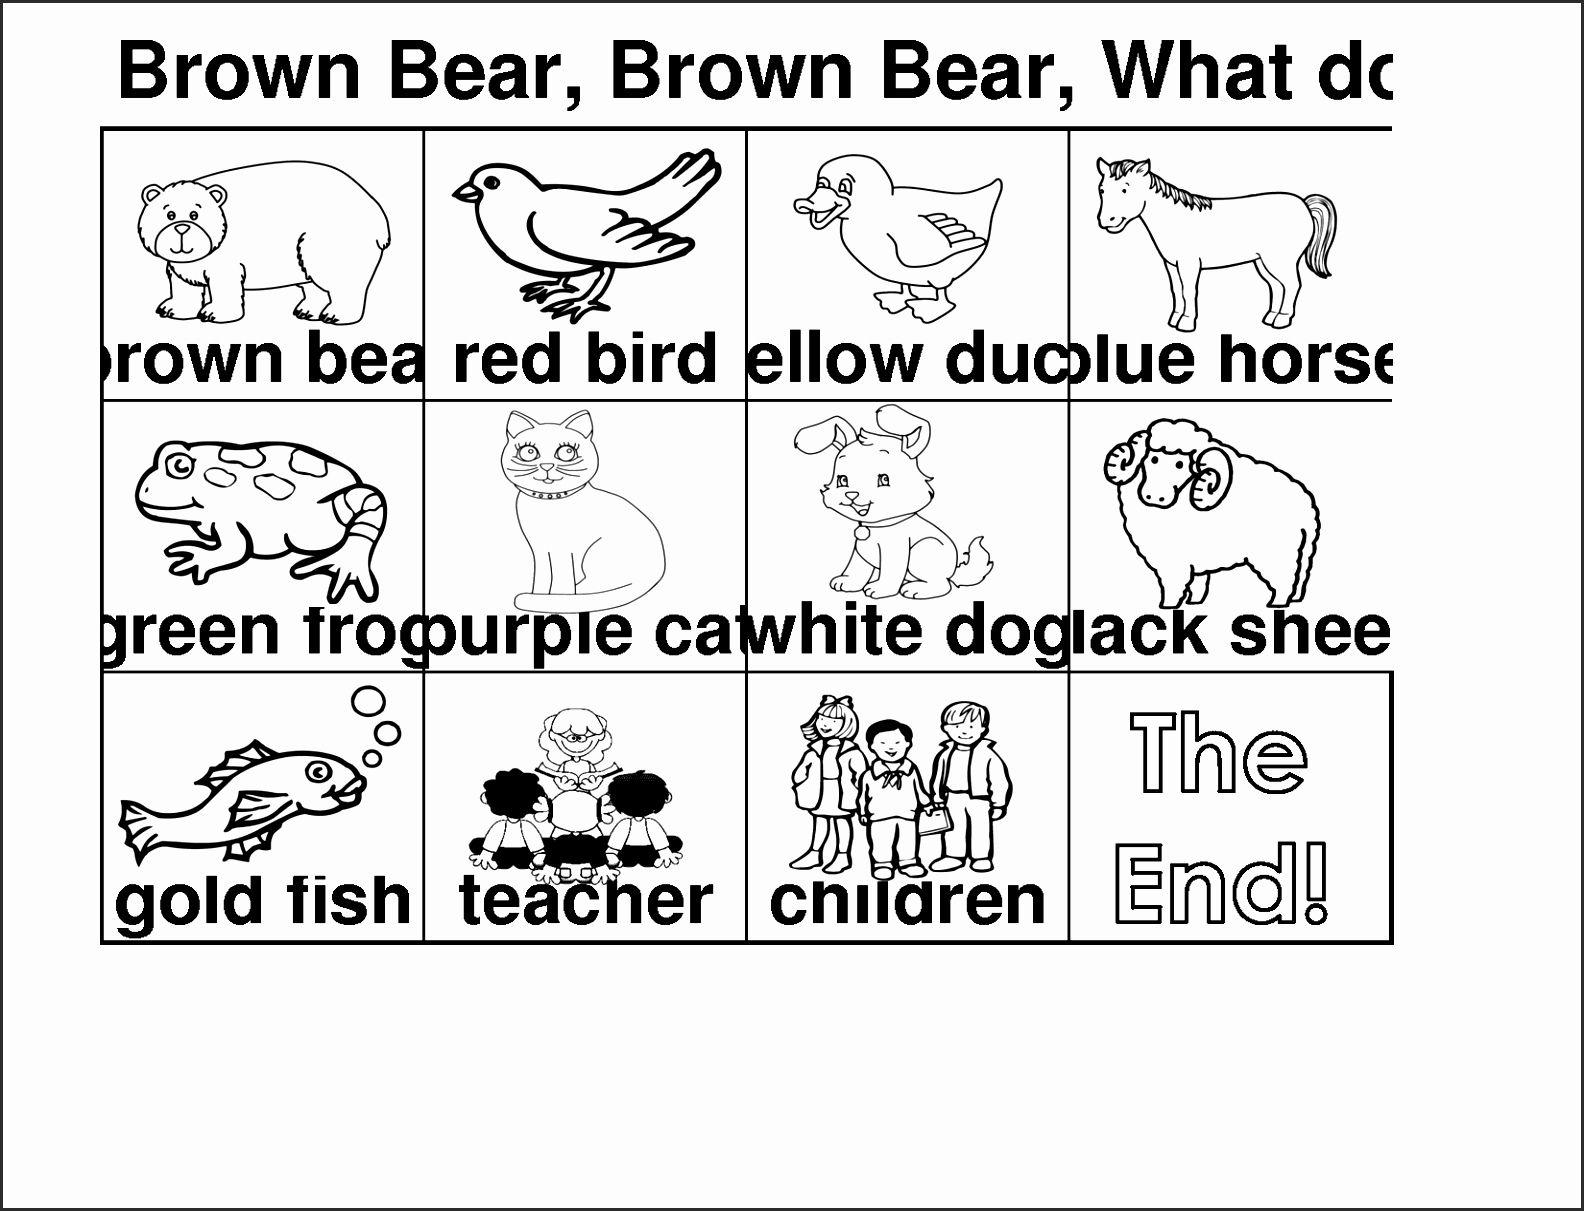 Brown Bear Brown Bear What Do You See Mini Book Rtllh Fresh Brown Bear Coloring Page Eric Carle Many Interesting Bear Coloring Pages Brown Bear Book Mini Books